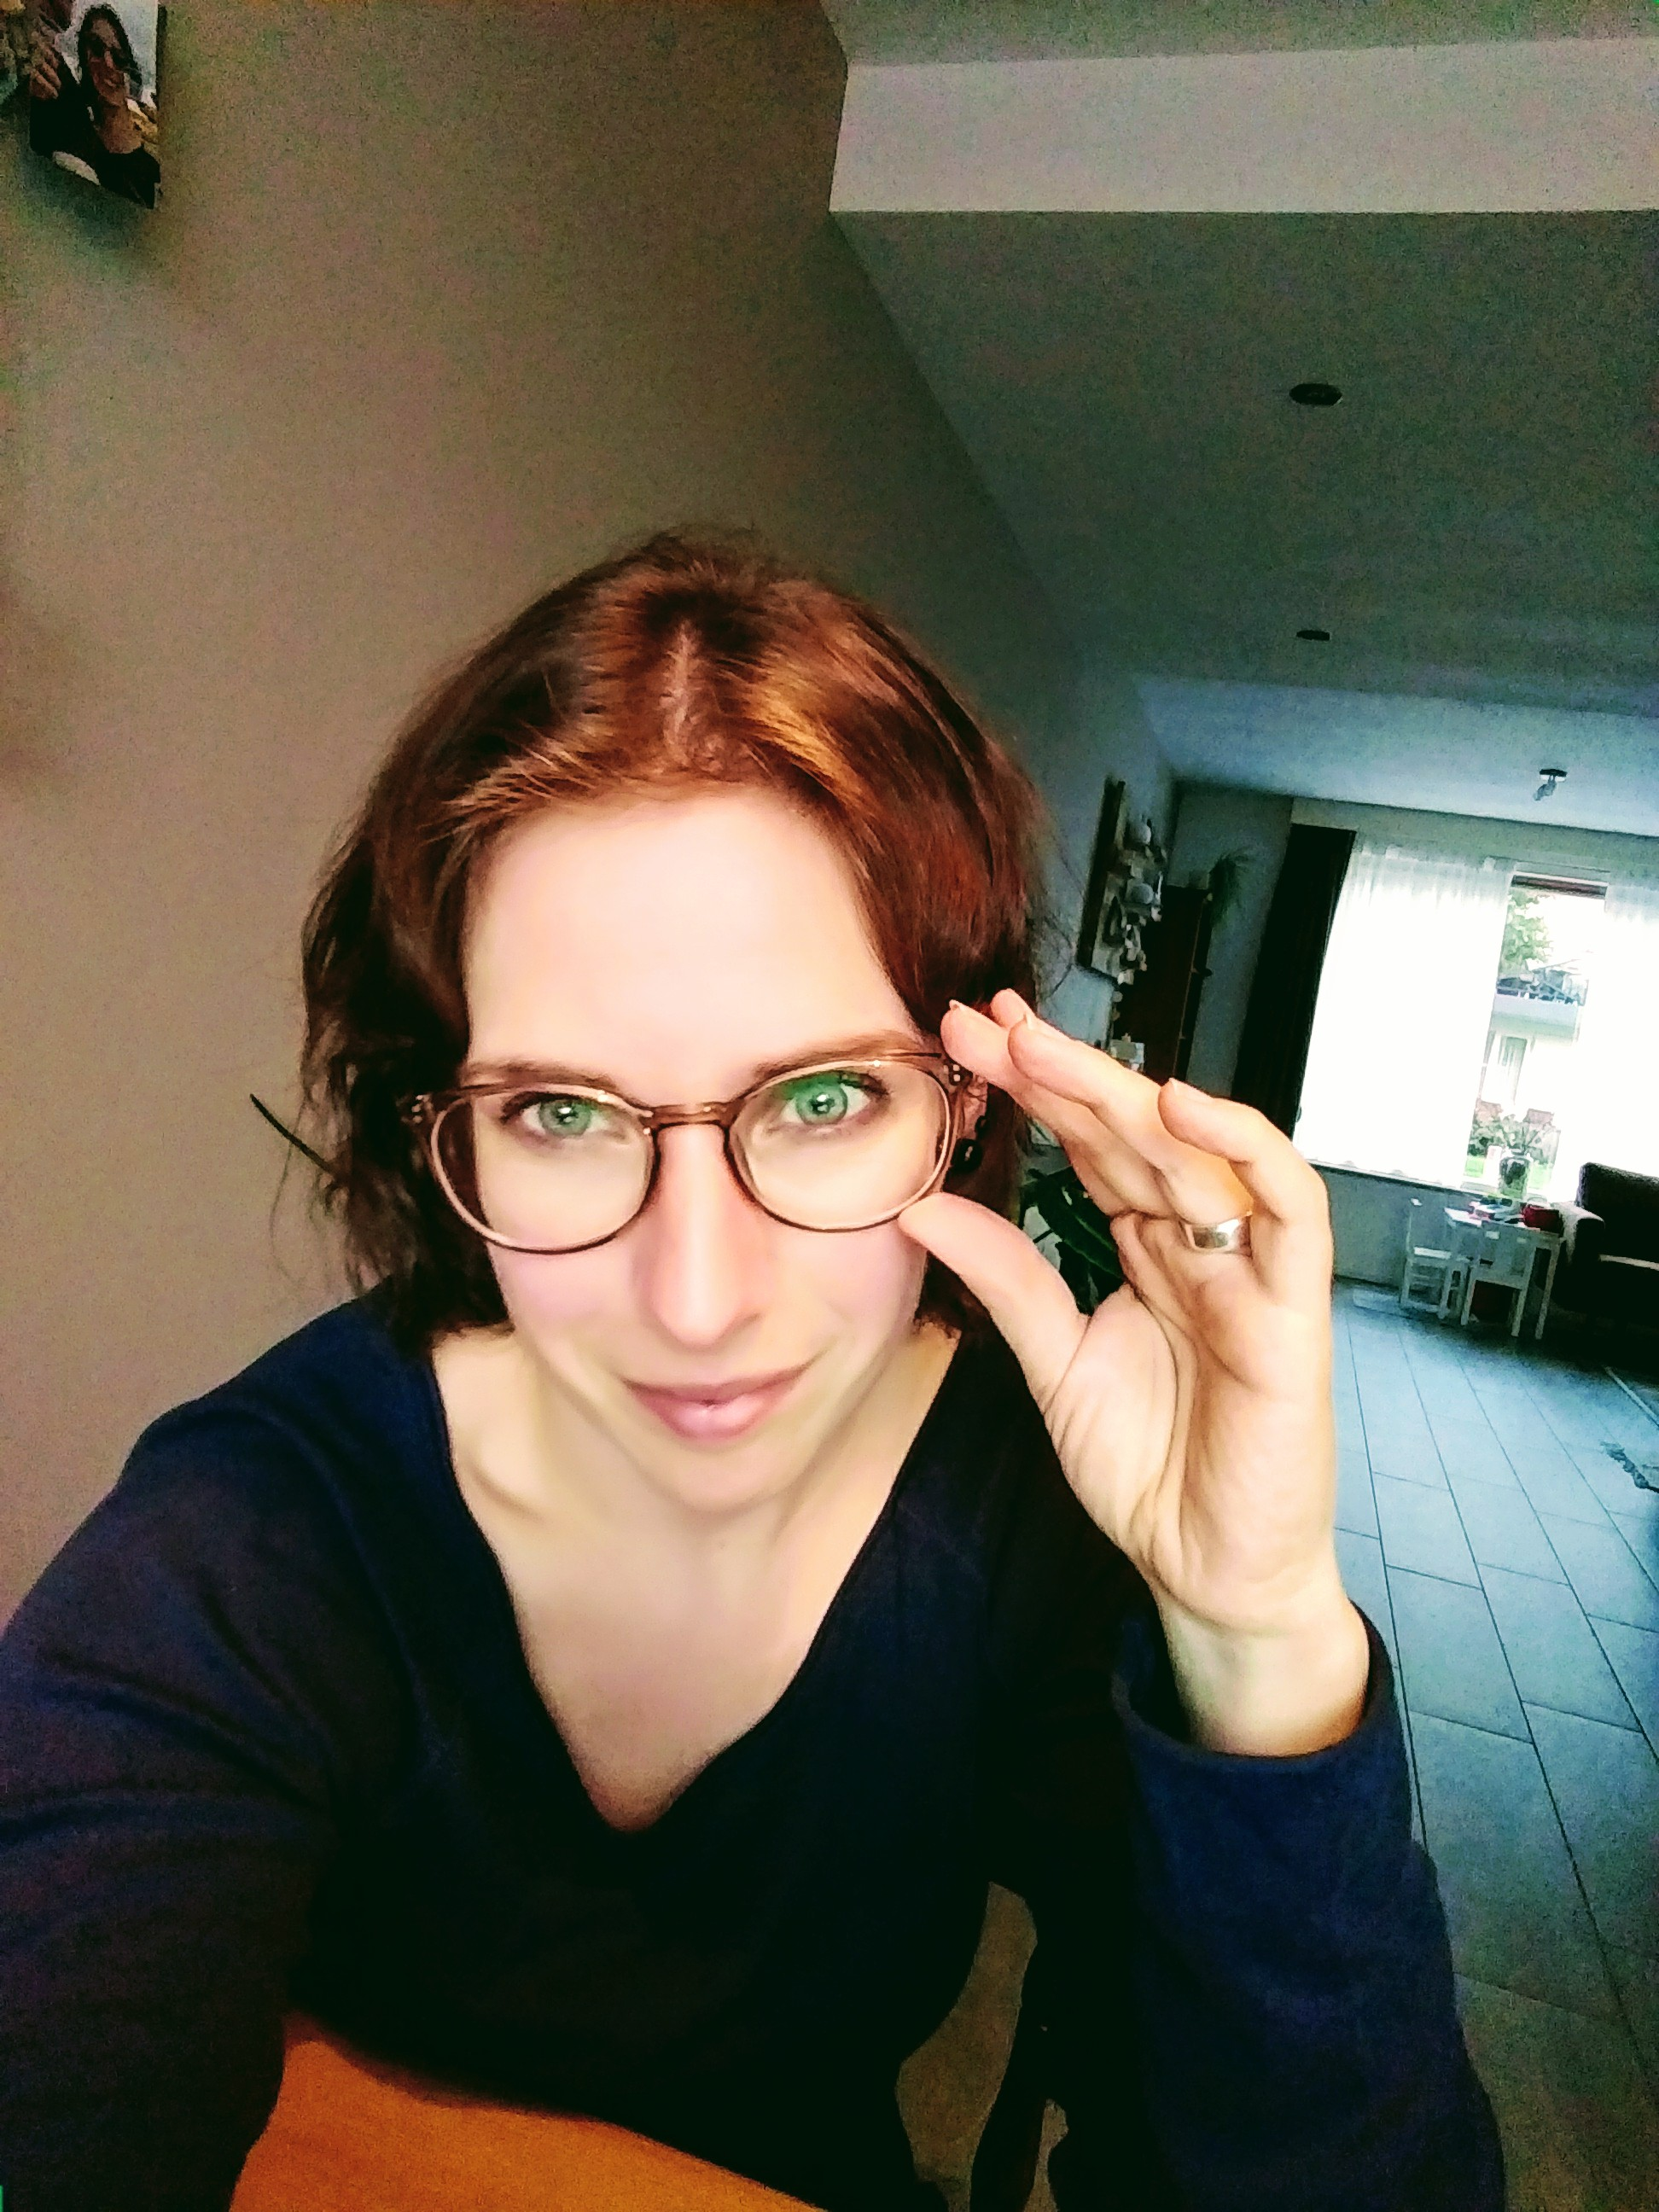 happy moments, geluksmomentjes, blog, efteling, mamablog, mamablogger, meisjesmama, sprookjesbos, lifestyleblog, lalogblog, la log, lalog.nl